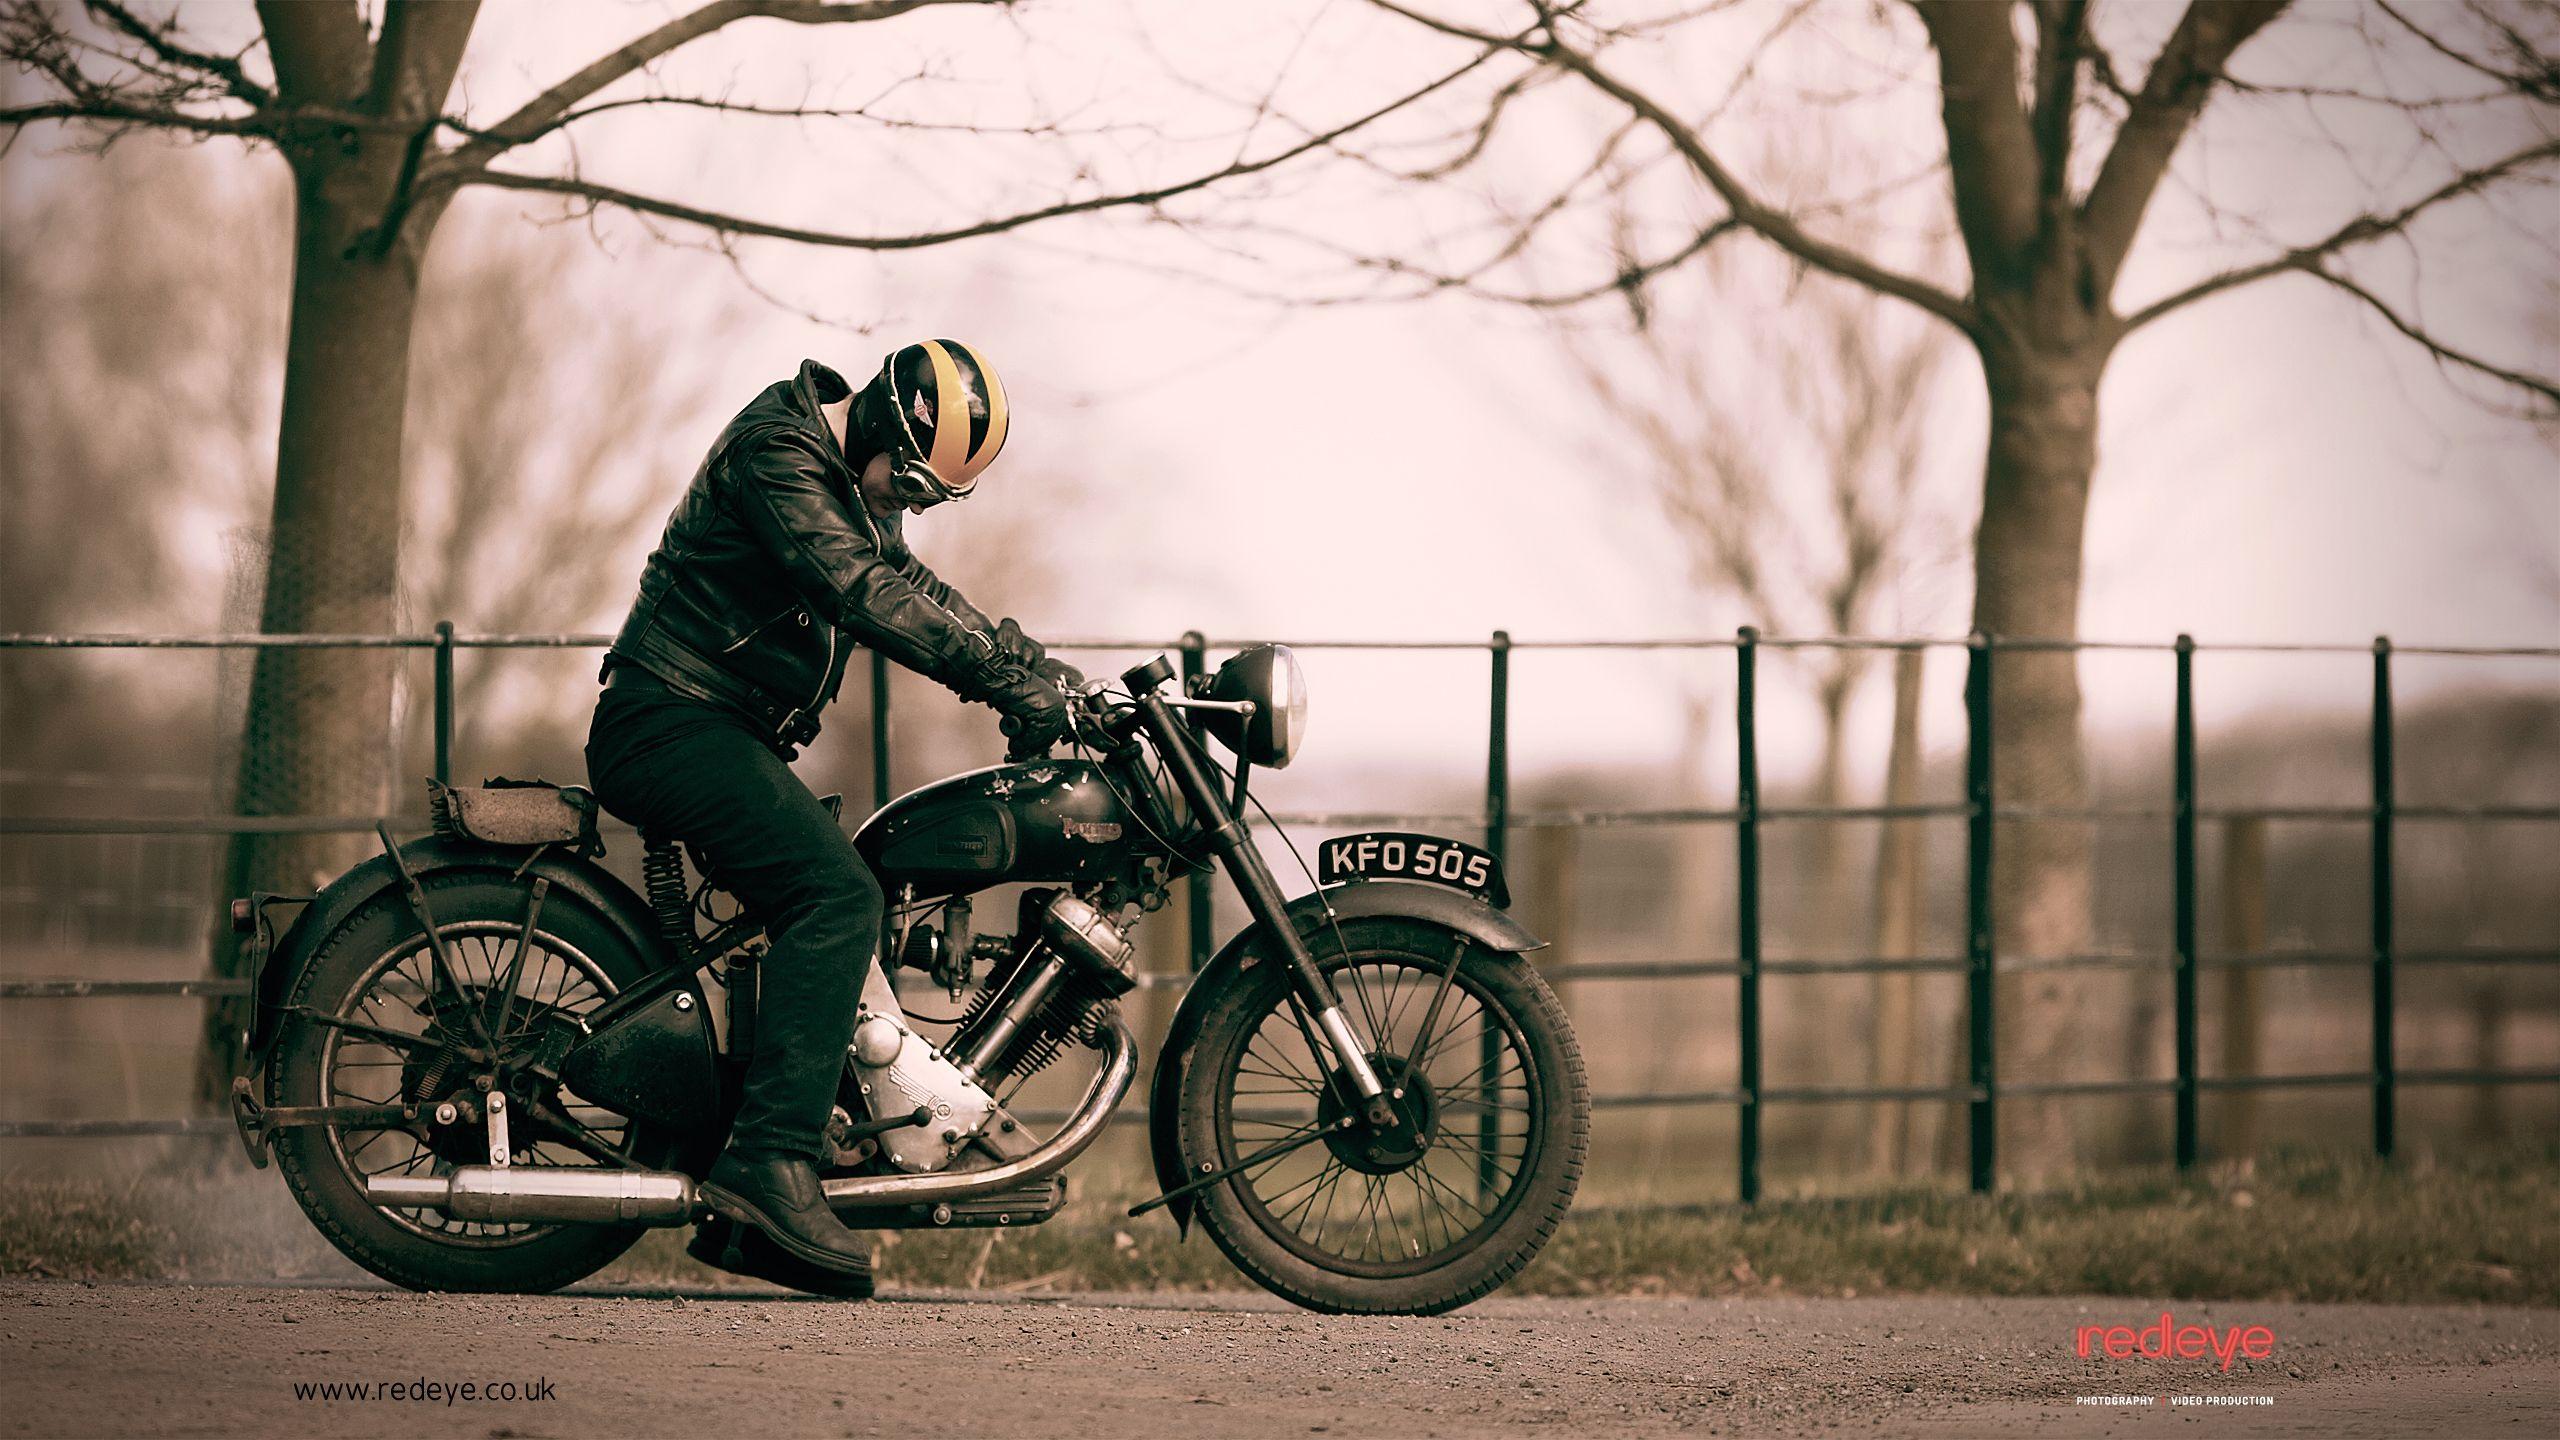 Classic Bike Wallpaper Classic Bikes Motorcycle Wallpaper Bike Photography